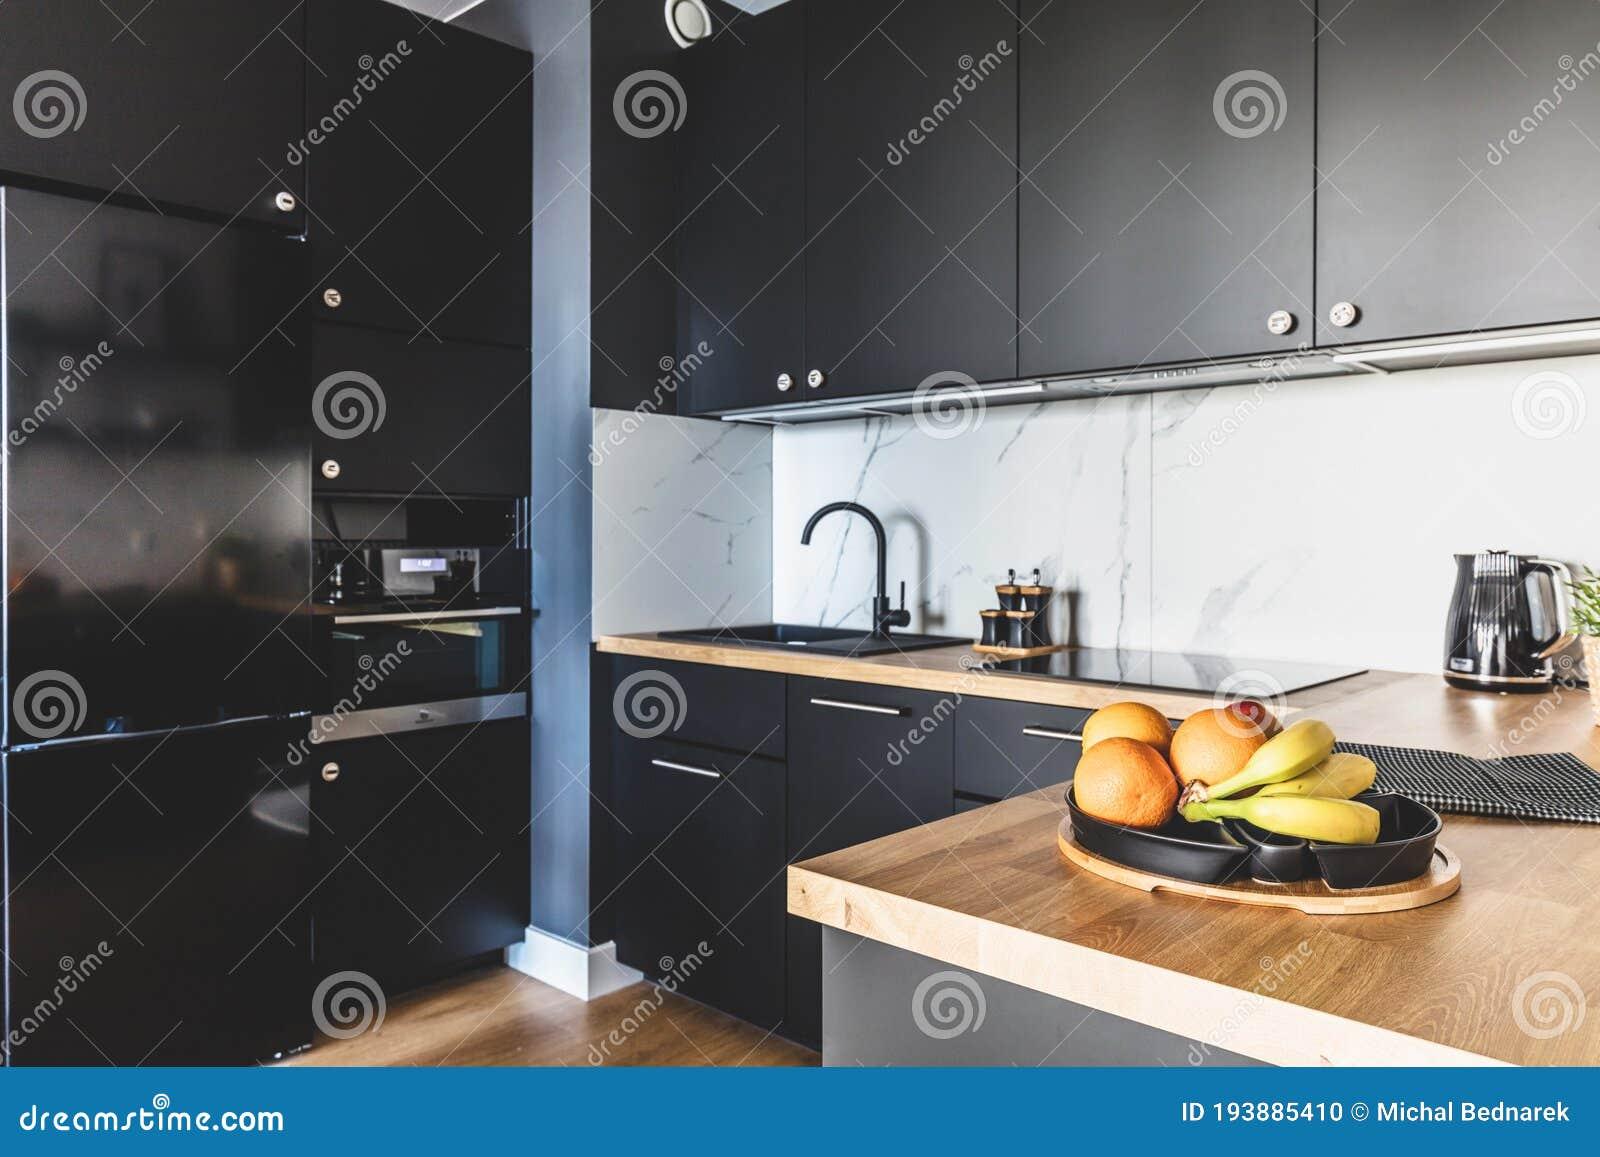 Kitchen In A Modern Studio Apartment For Rent Interior Design Stock Photo Image Of Decoration Design 193885410